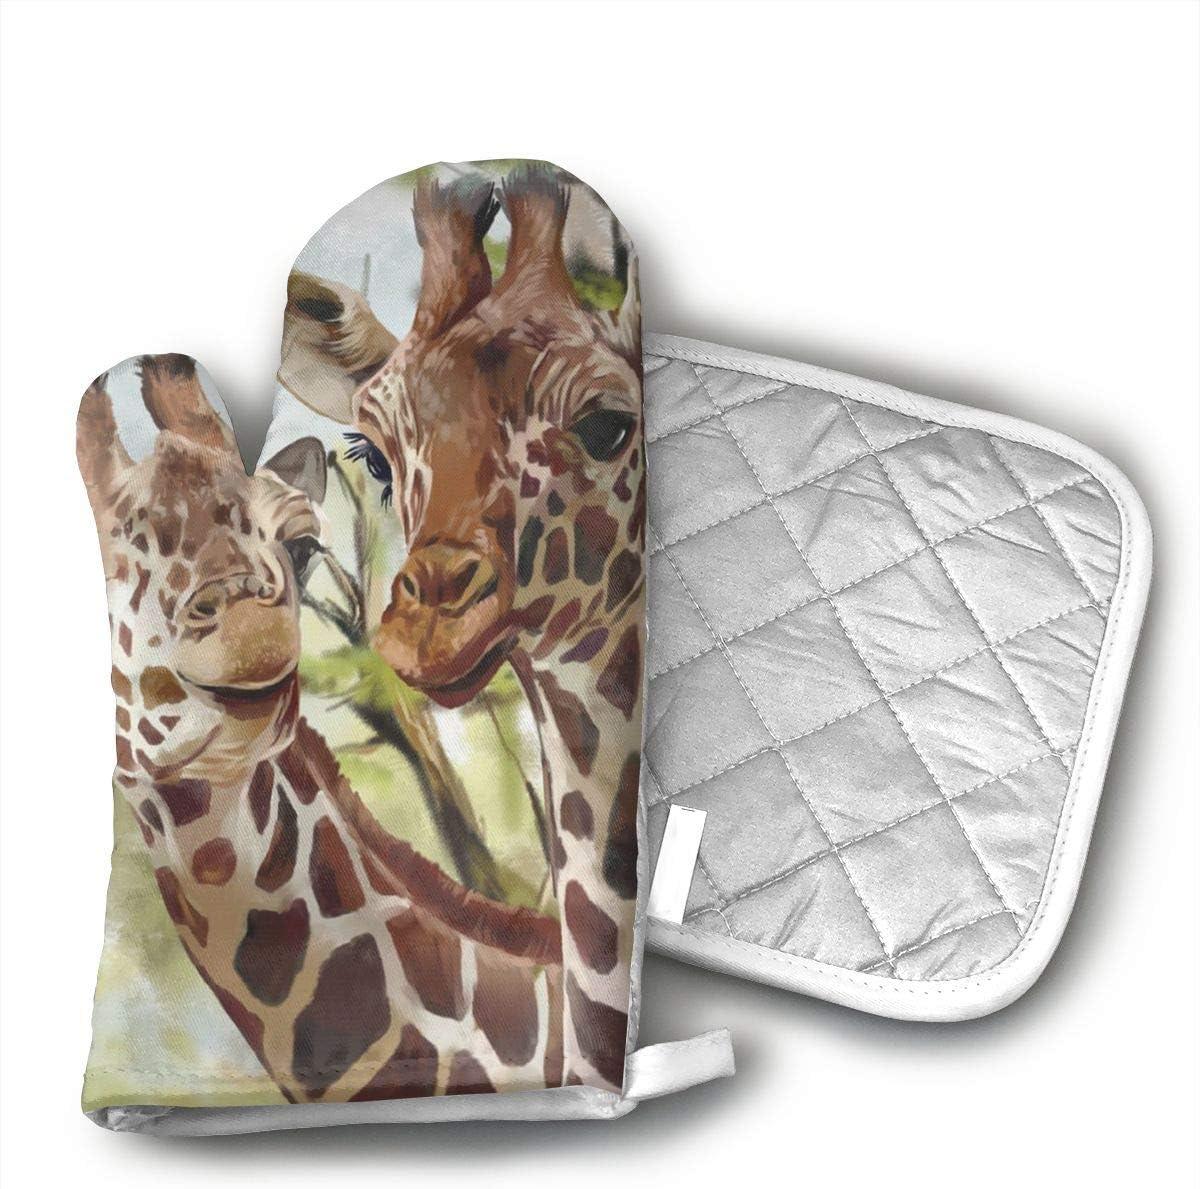 QEDGC Watercolor Deer Giraffe Long Kitchen Cotton Coating Oven Mitts Heat Resistant Potholder Gloves Microwave Oven Glove